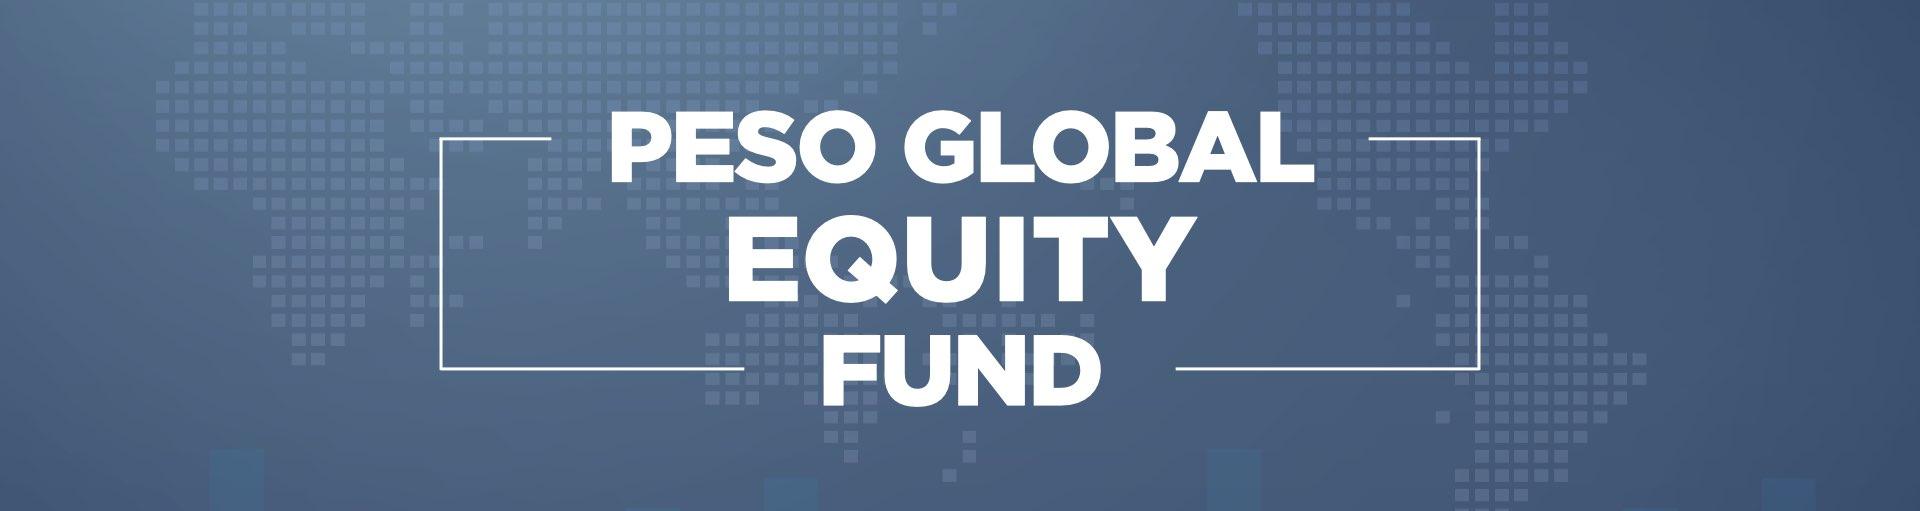 peso global equity fund